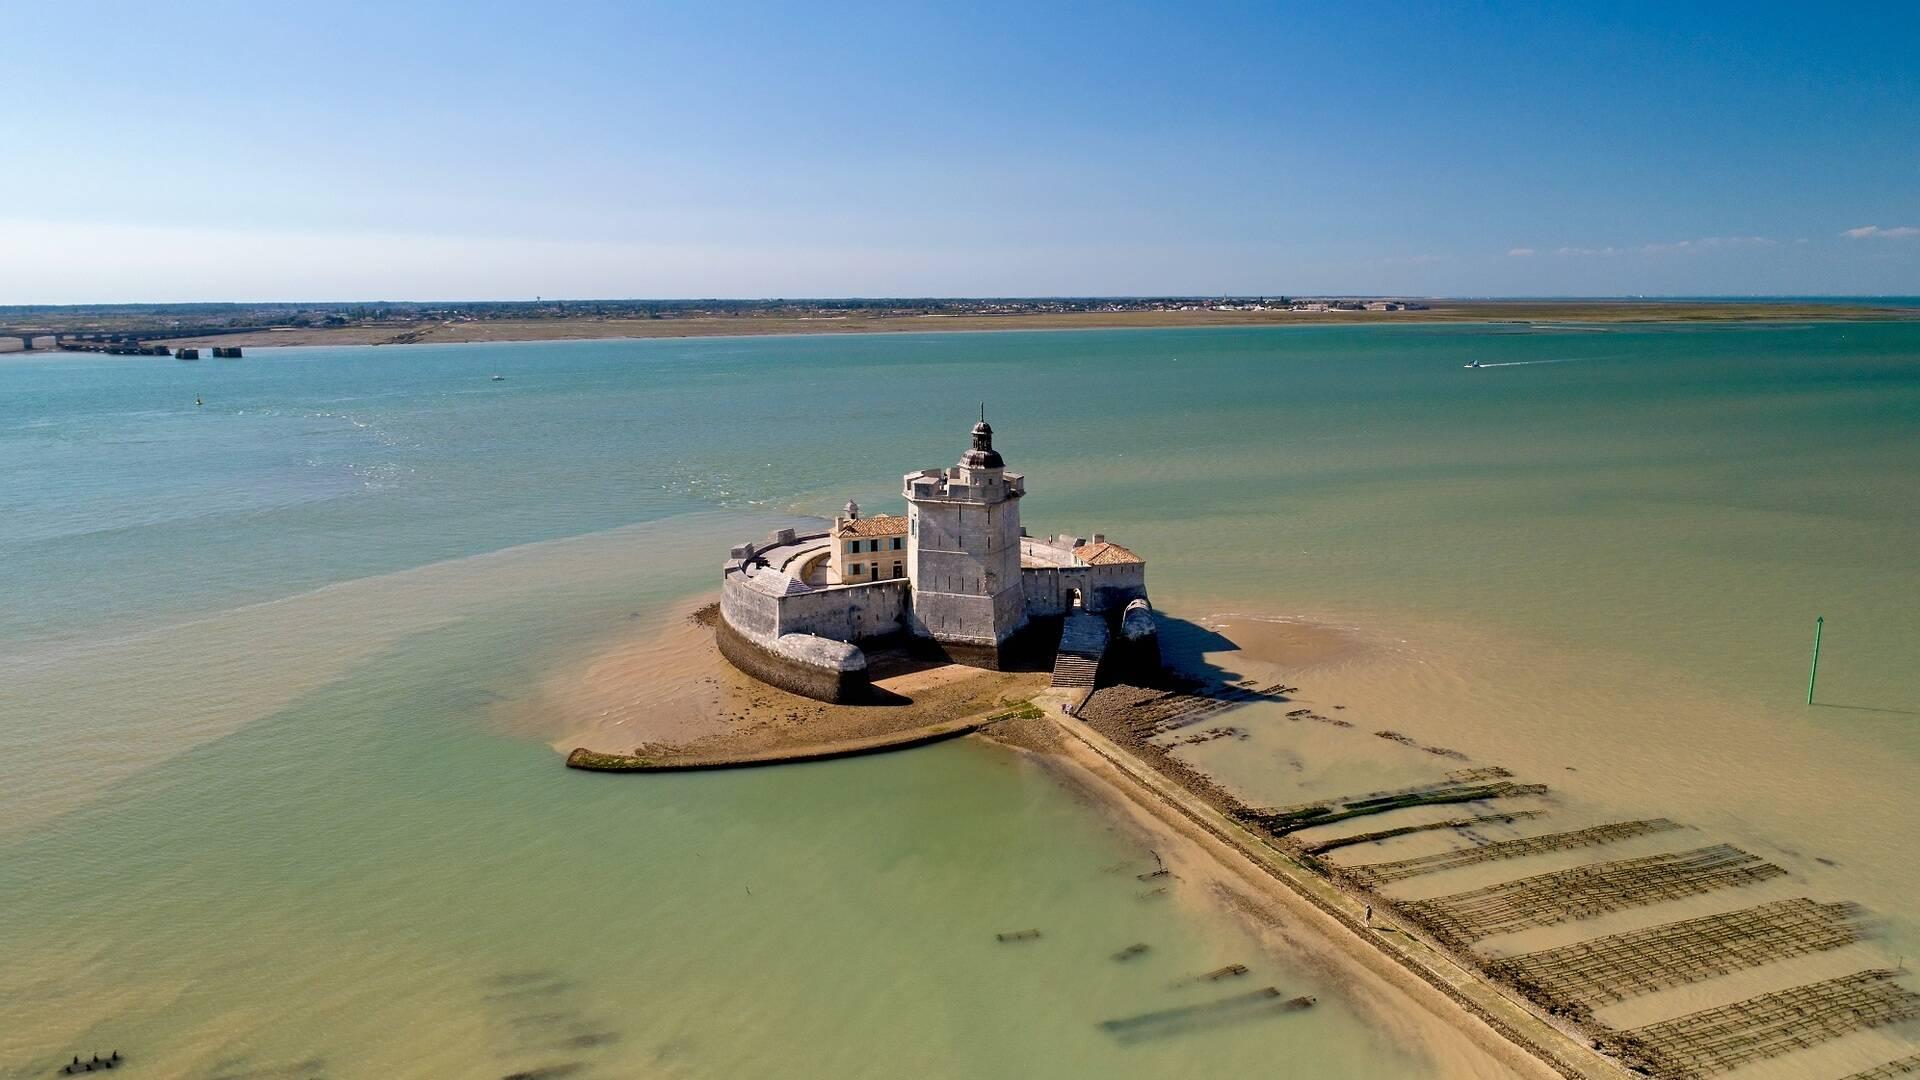 Vue aérienne du Fort Louvois - ©Shutterstock